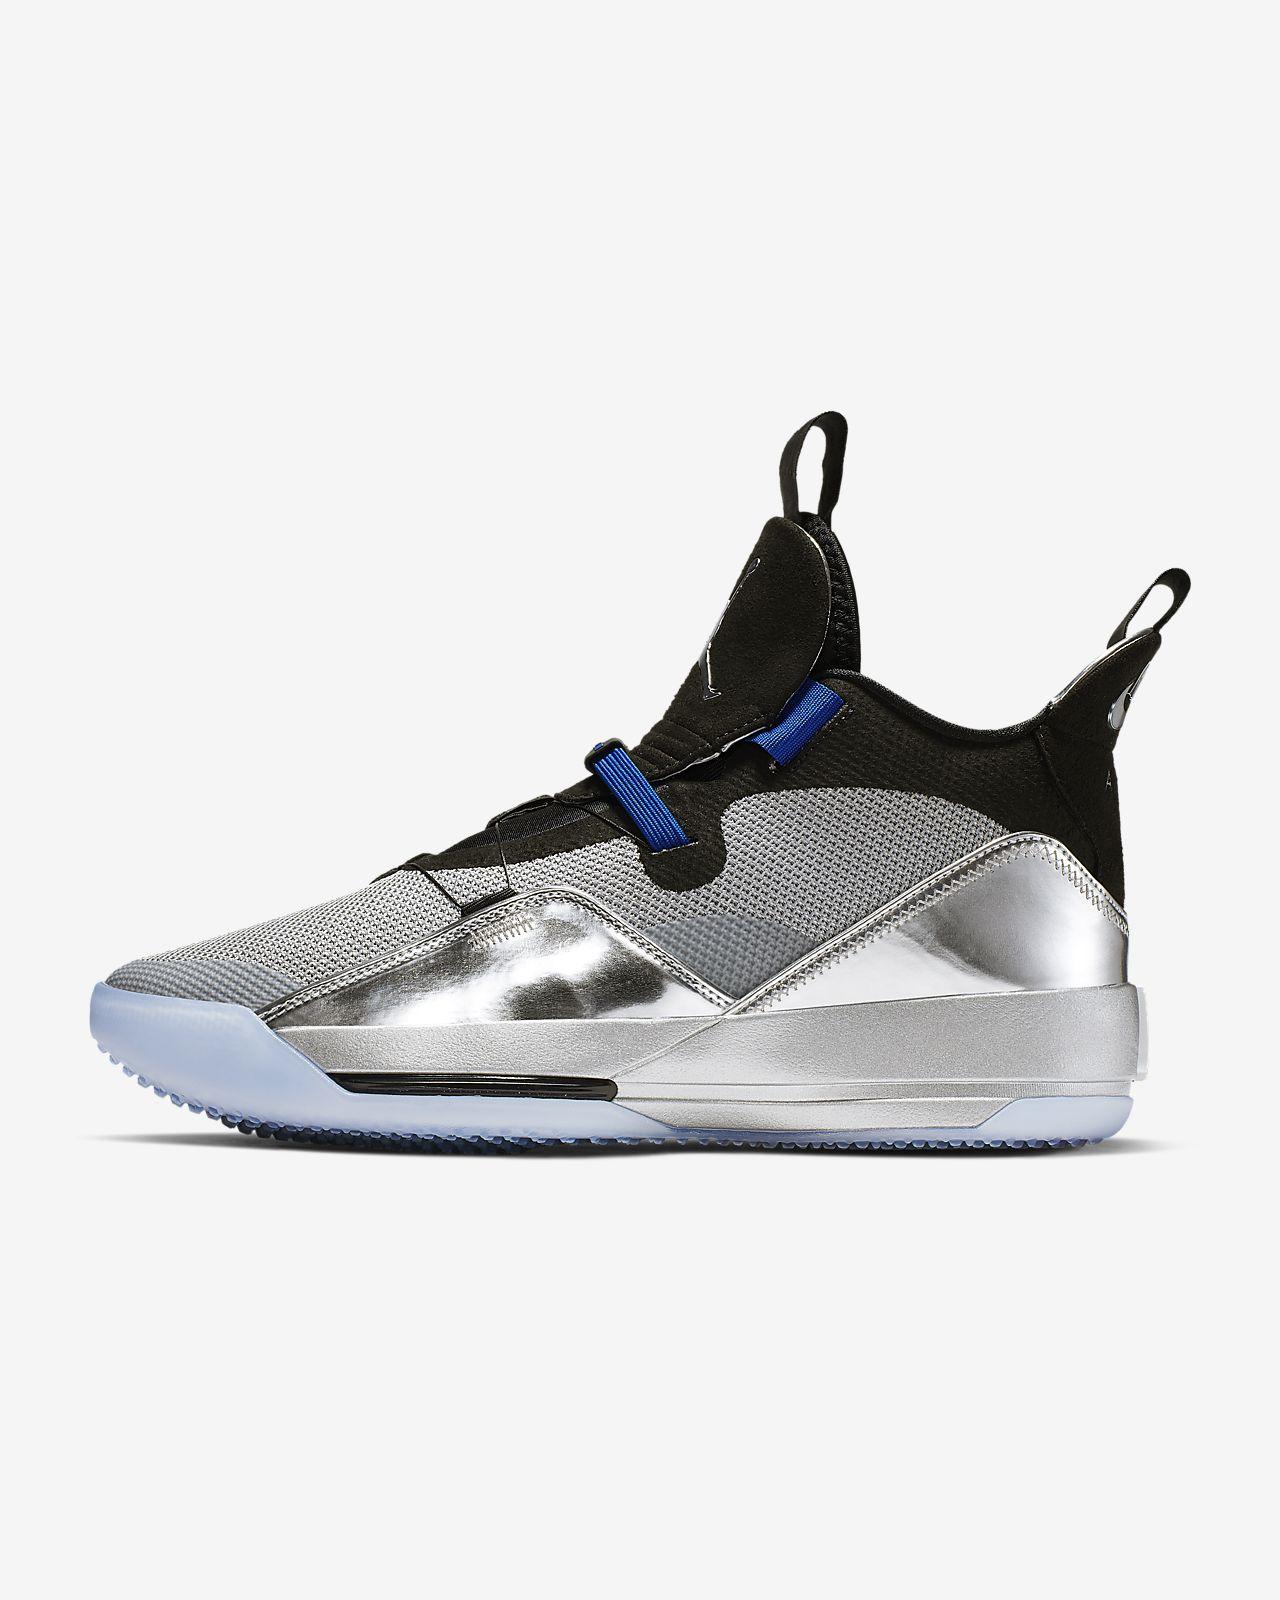 sale retailer 3af87 2900b ... Chaussure de basketball Air Jordan XXXIII pour Homme